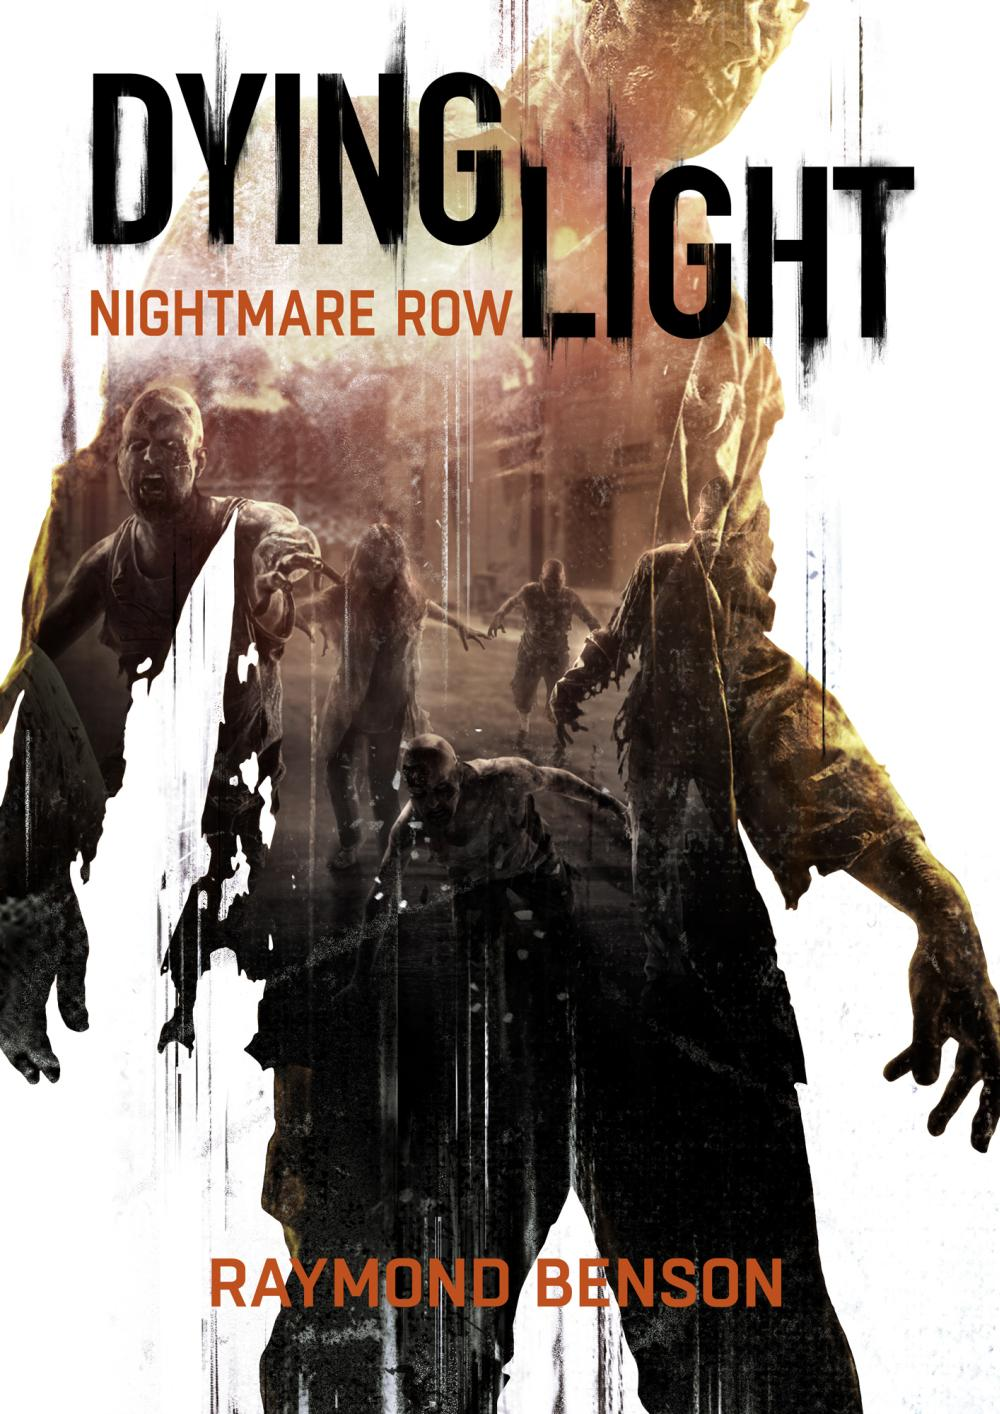 Dying Light by Raymond Benson